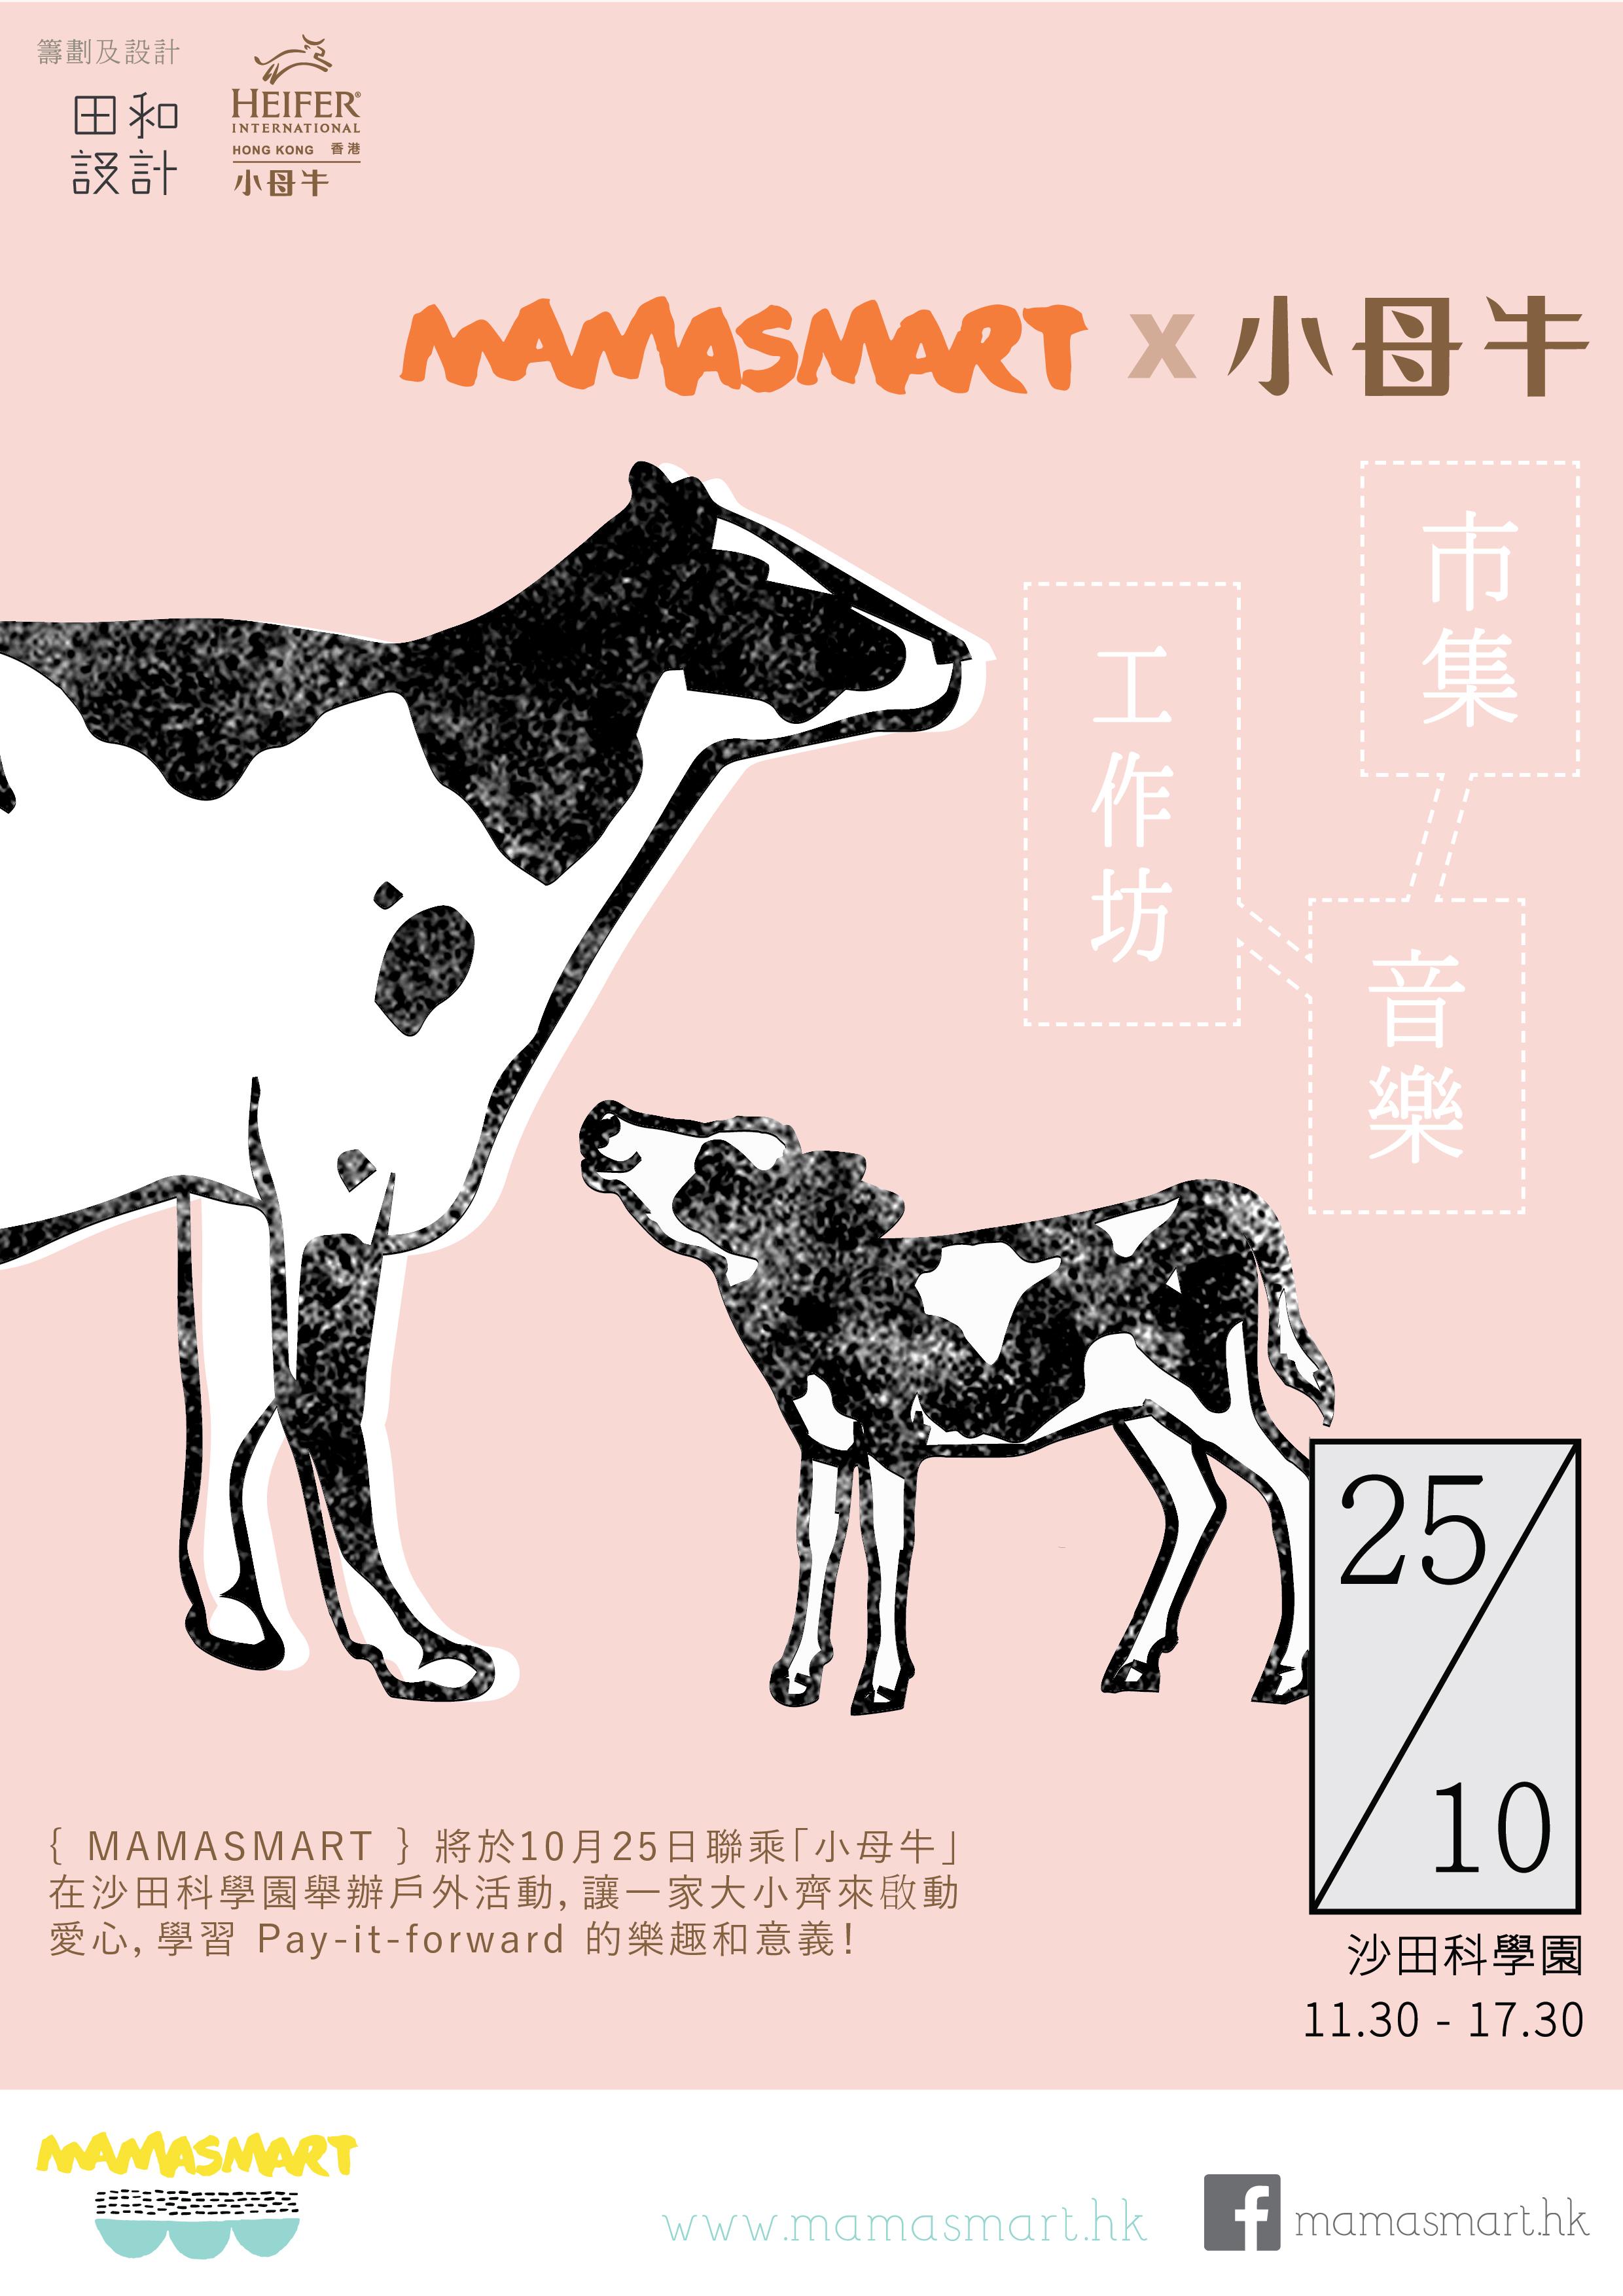 EVENT & GRAPHIC DESIGN FOR HEIFER INTERNATIONAL (HONG KONG) - 2015